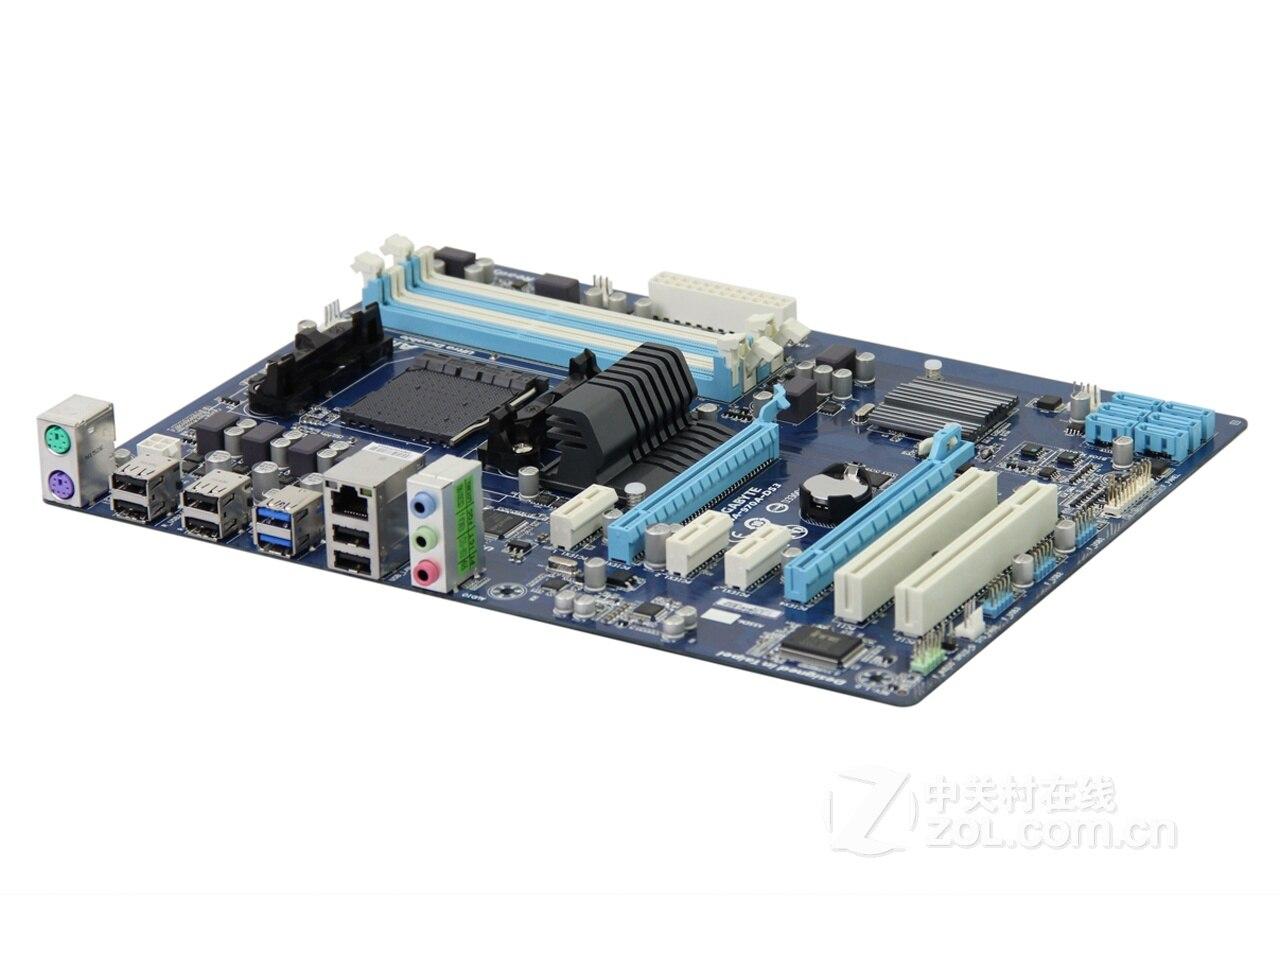 Интернет магазин товары для всей семьи HTB1v7m_XODxK1Rjy1zcq6yGeXXai Разъем AM3 + для AMD 970 гигабайт GA-970A-DS3 100% Оригинал материнская плата DDR3 DIMM USB3.0 32G гигабайт 970A-DS3 Desktop SATA III